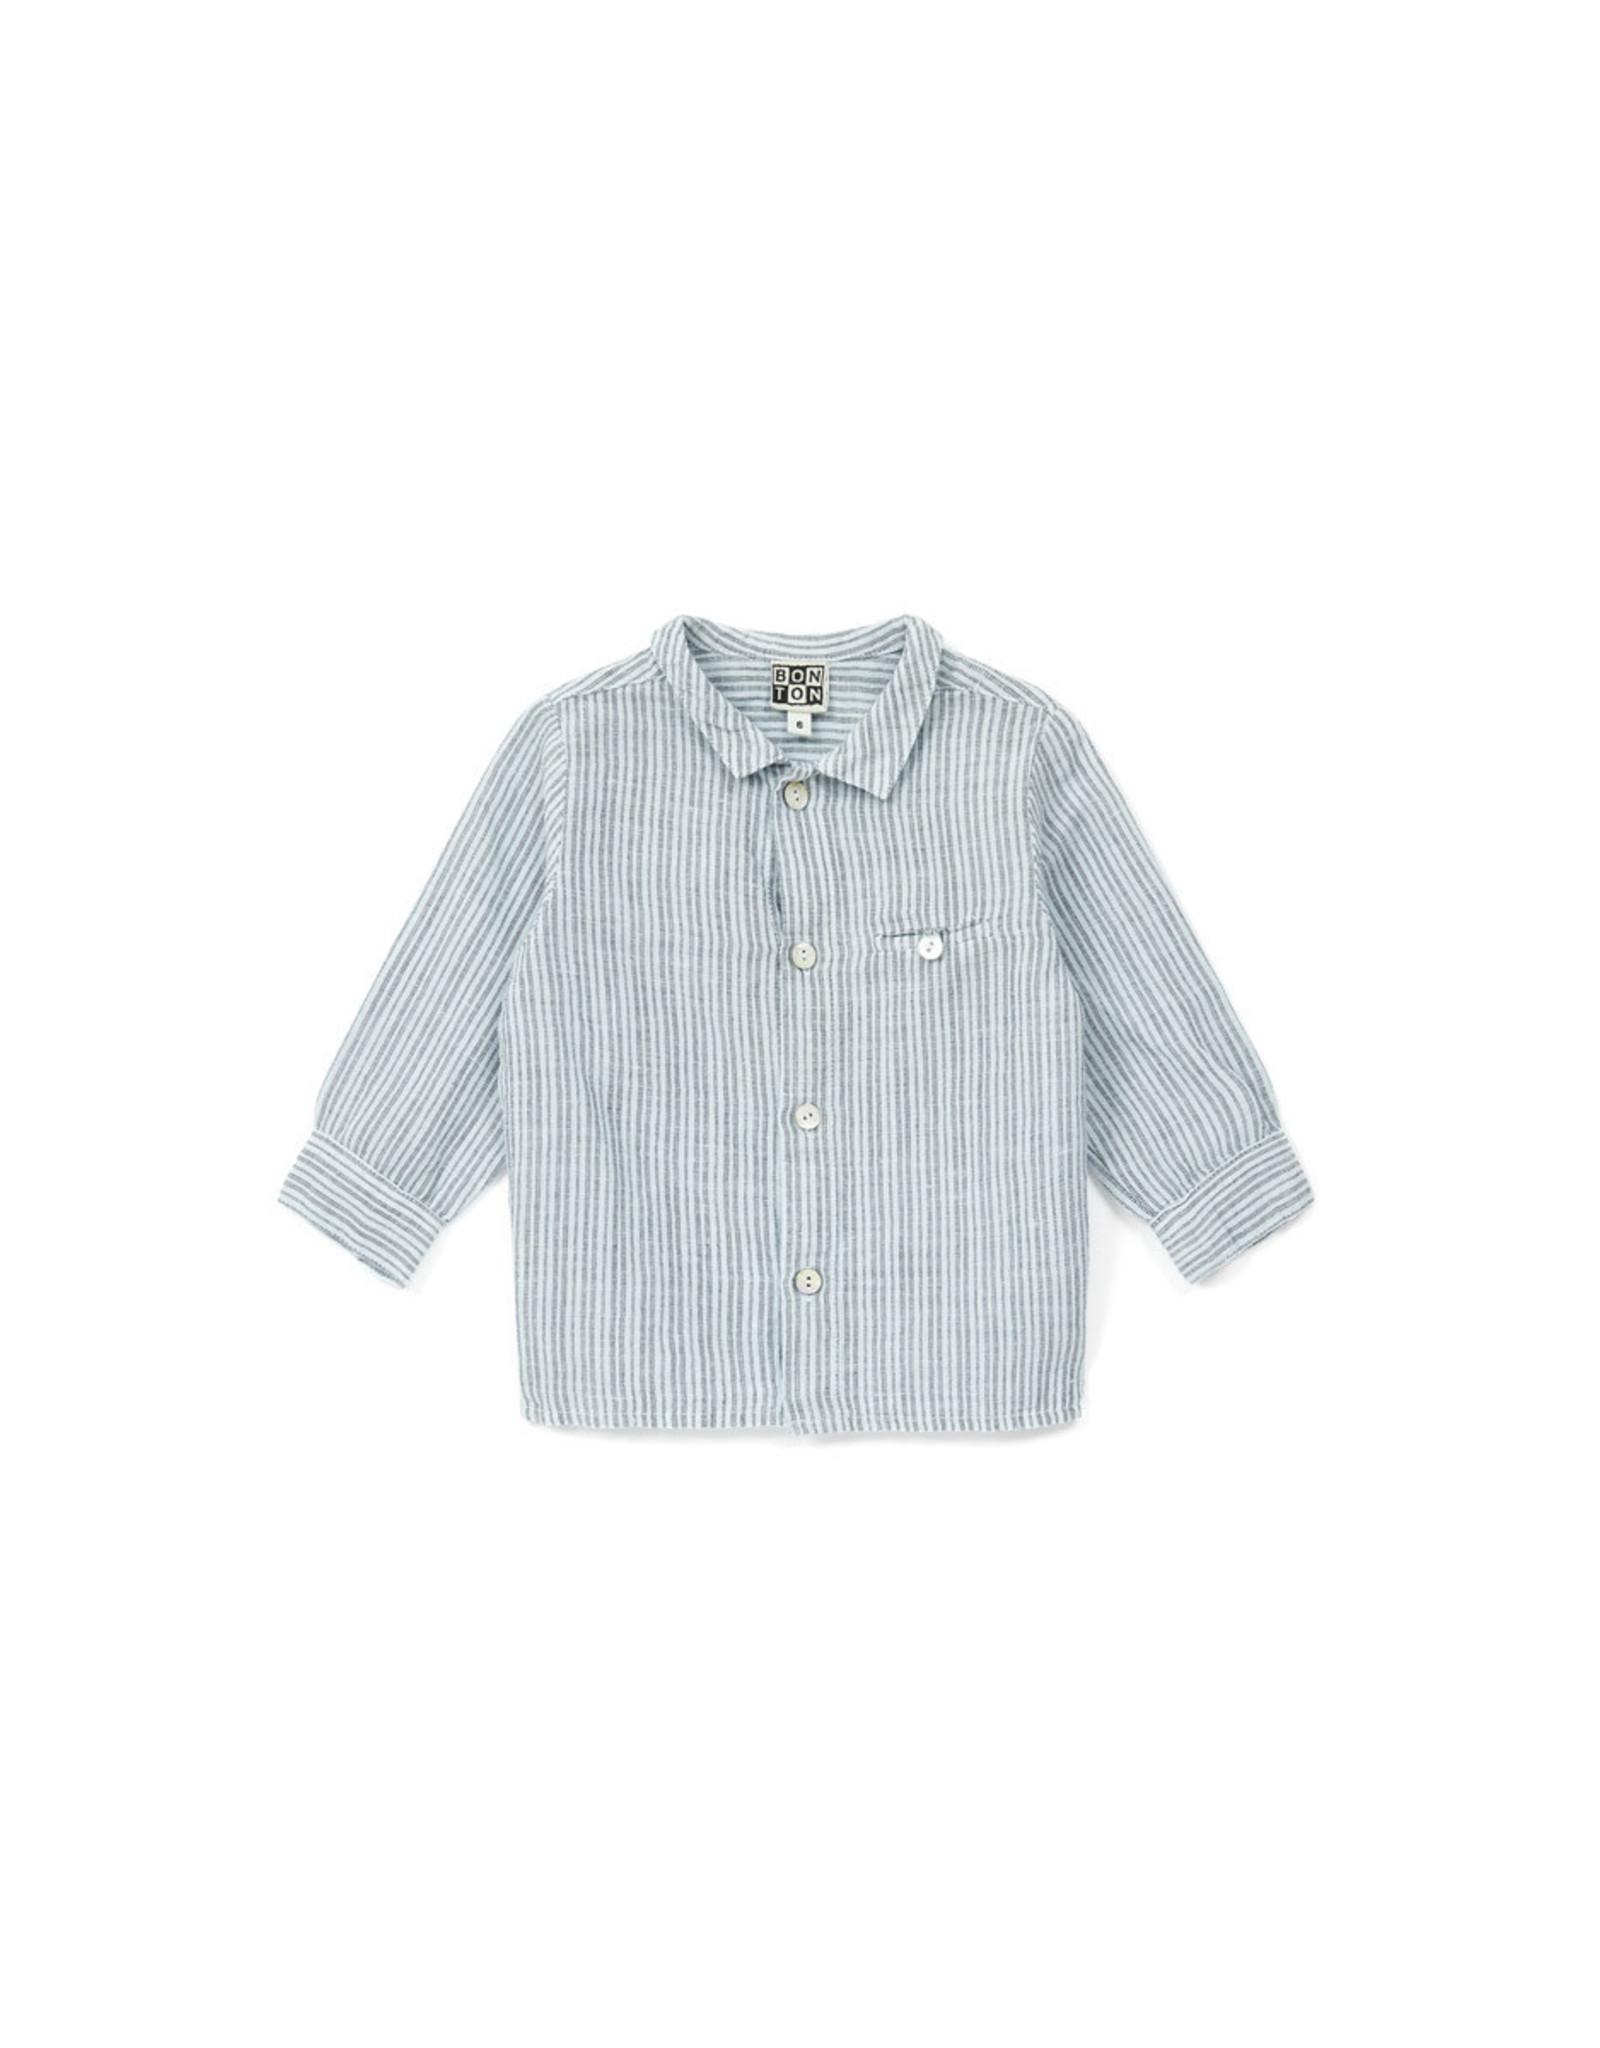 Bonton Journalr shirt